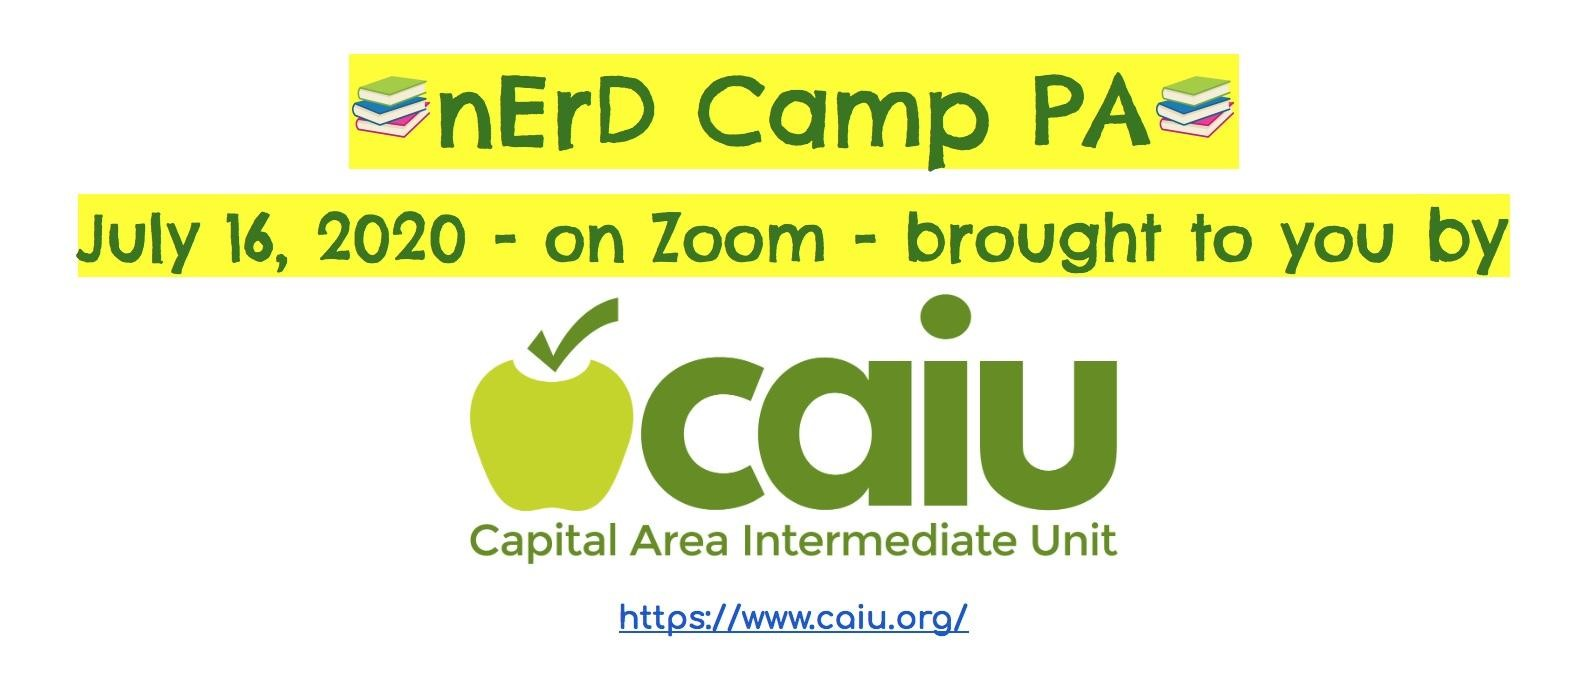 nErD Camp PA